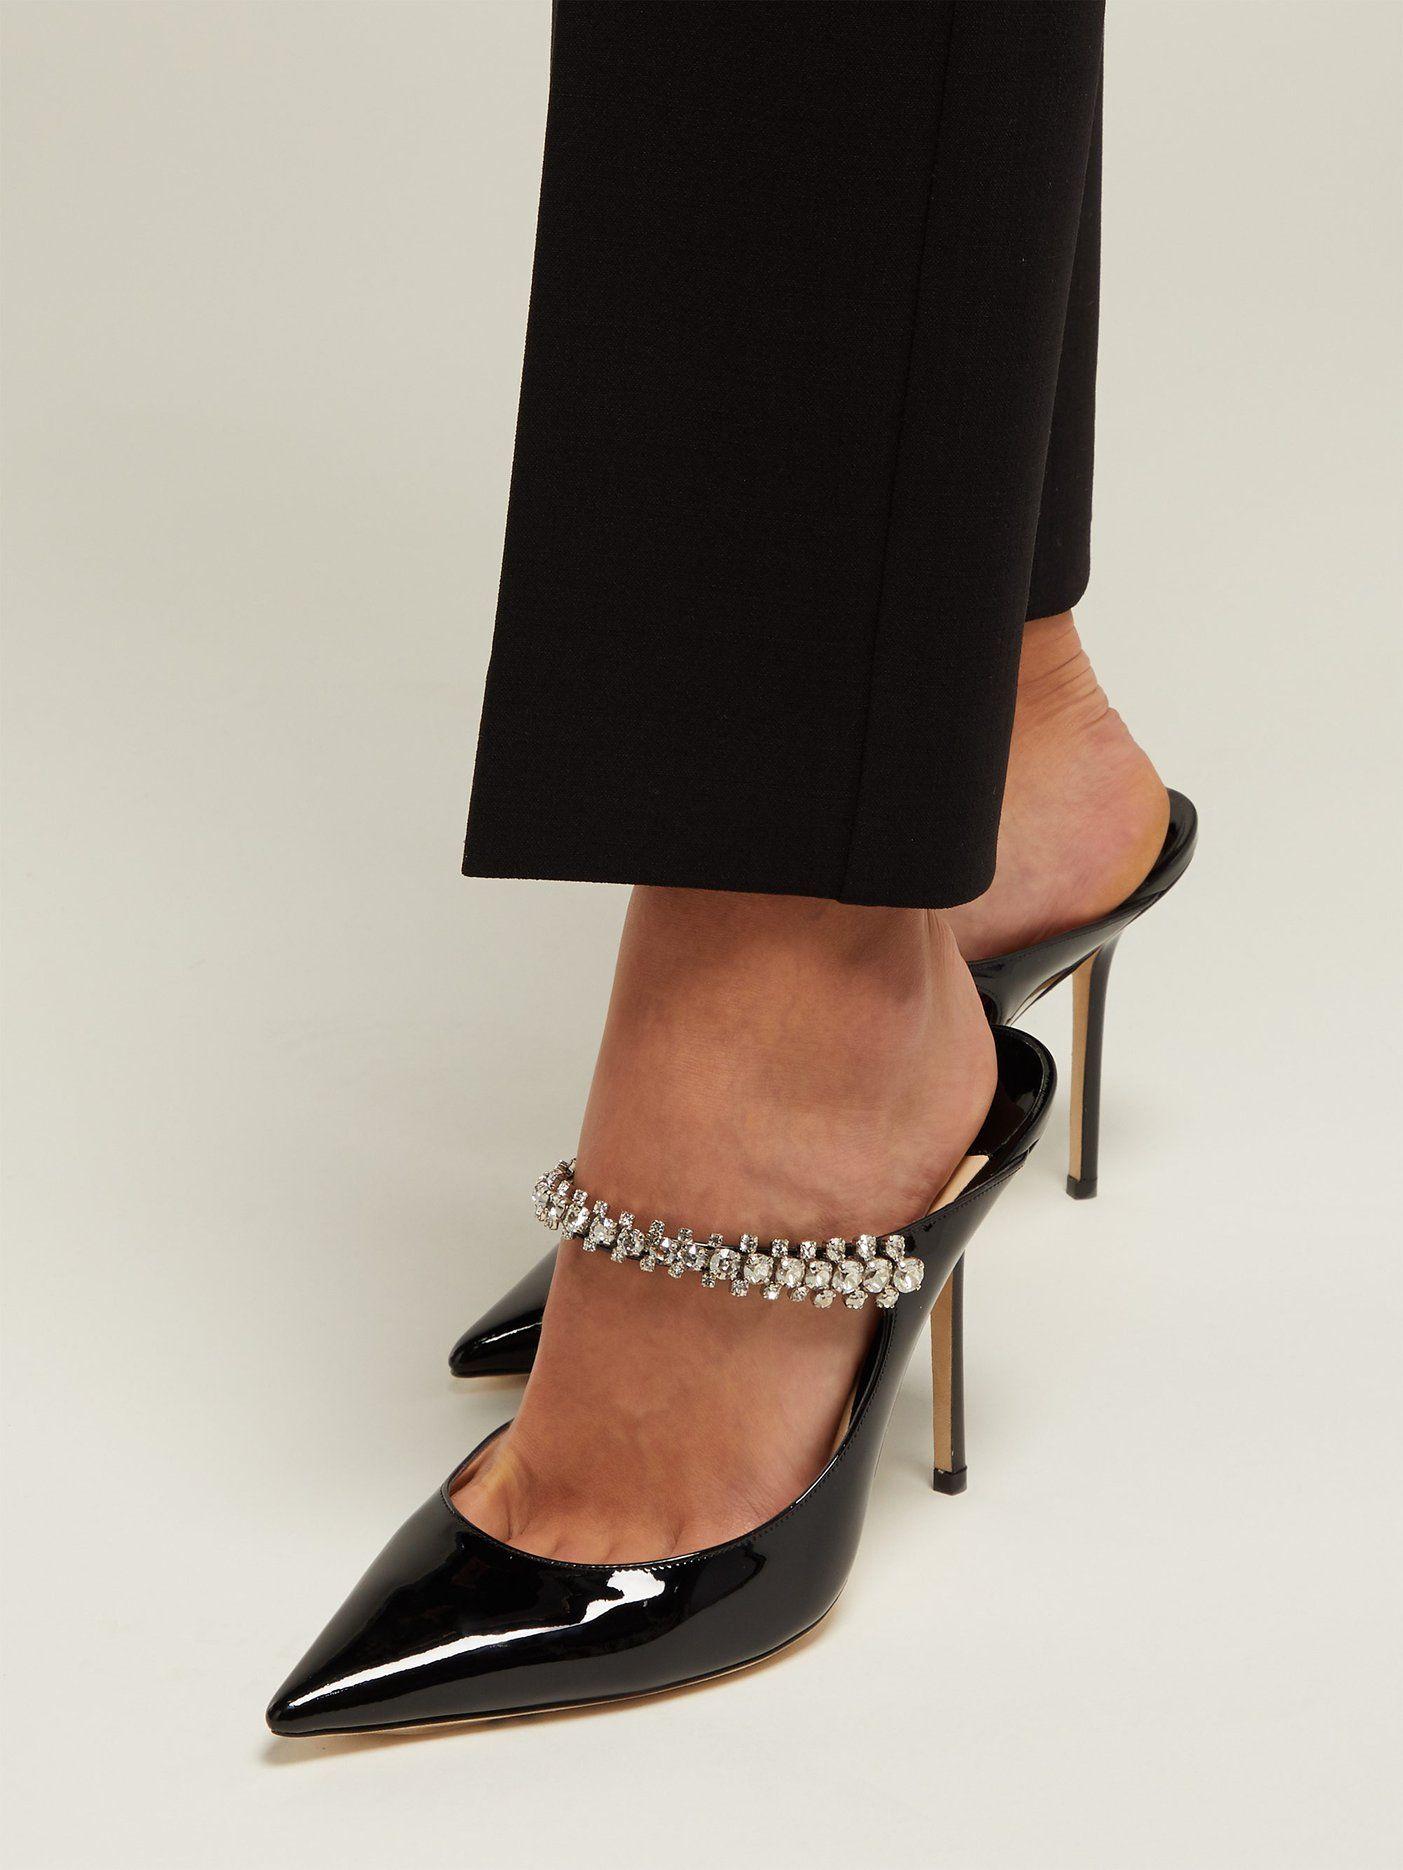 3836e182bdf Bing 100 crystal-embellished leather mules | Jimmy Choo |  MATCHESFASHION.COM US